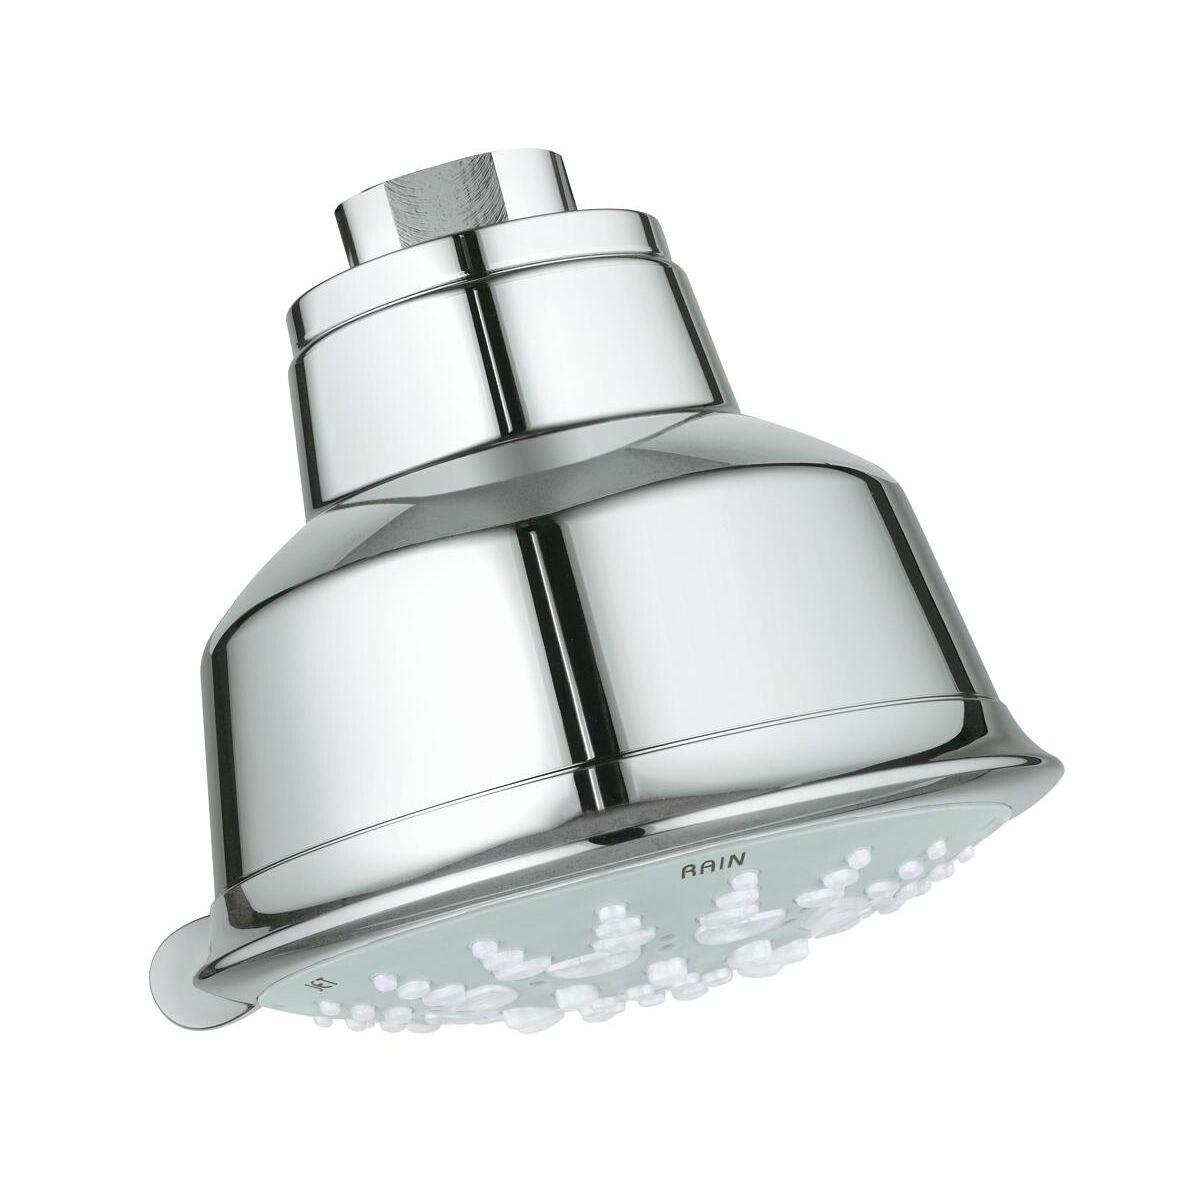 Grohe Relexa Rustic 100 Five Shower Head 5 Sprays 27126001 Starlight Chrome